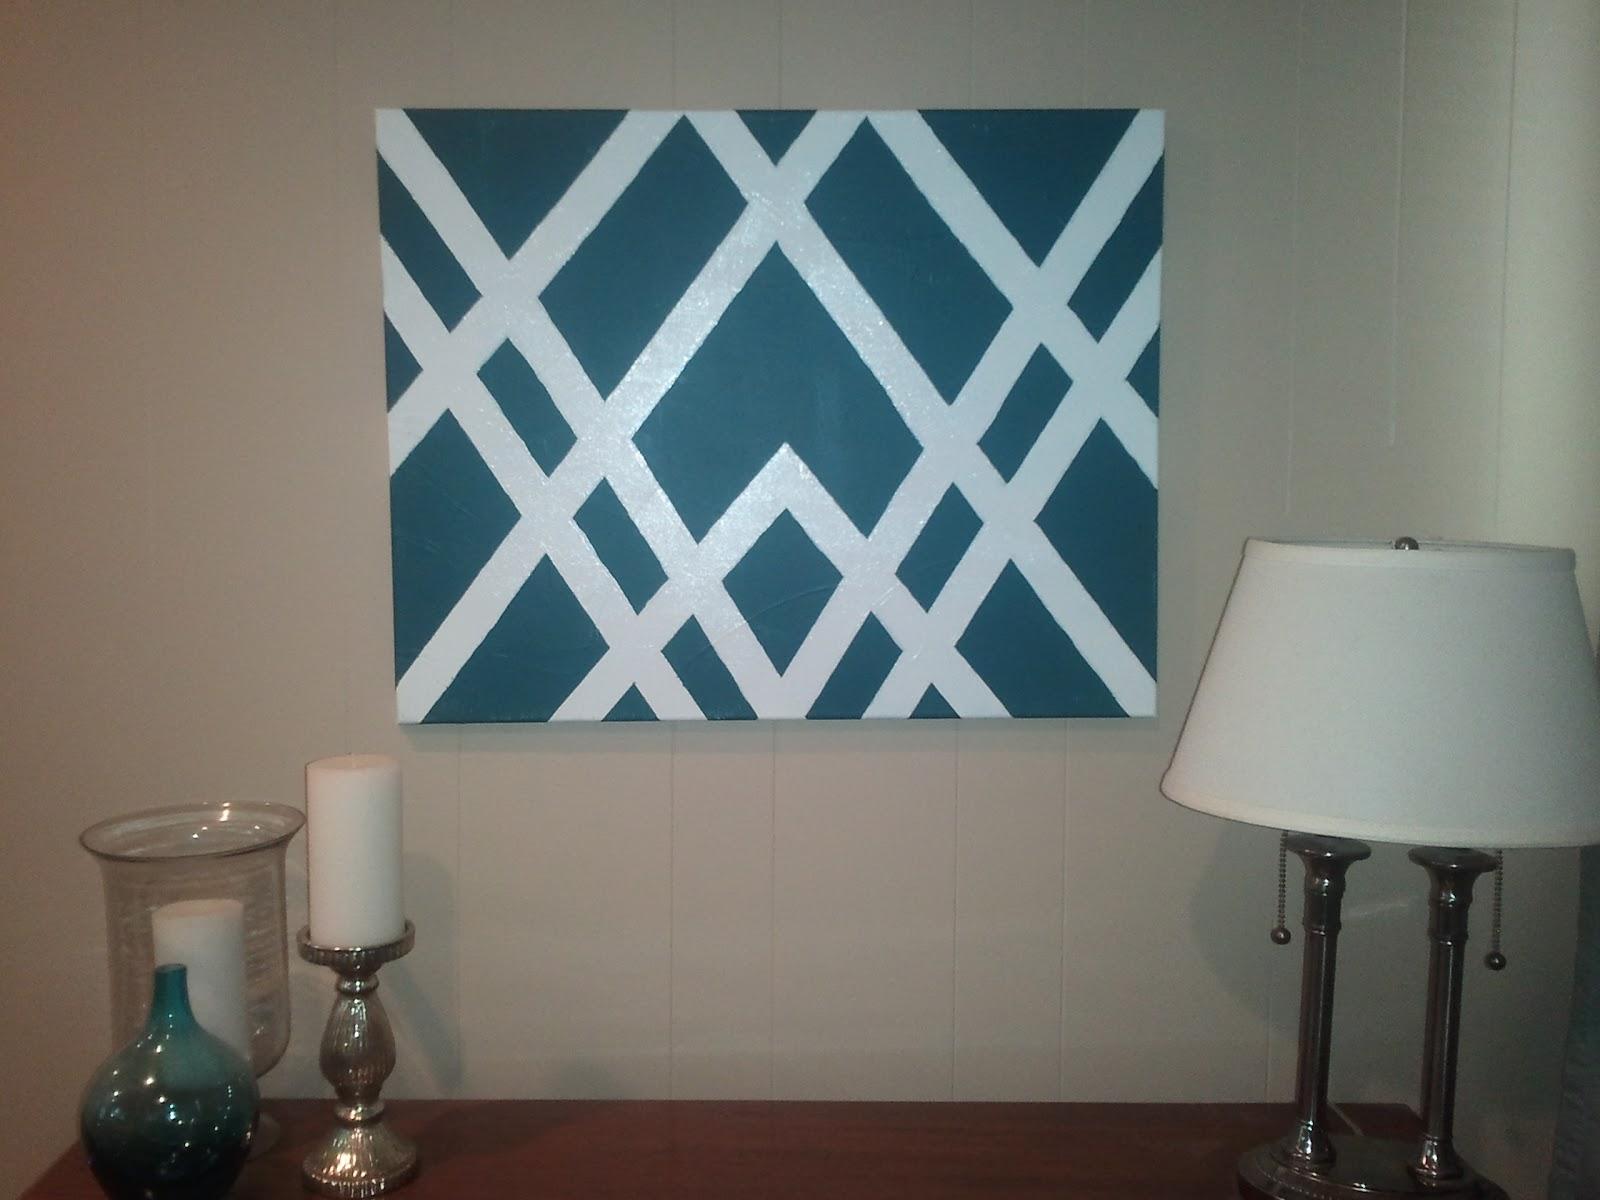 cardigan junkie: Pinterest Challenge: DIY Geometric Art